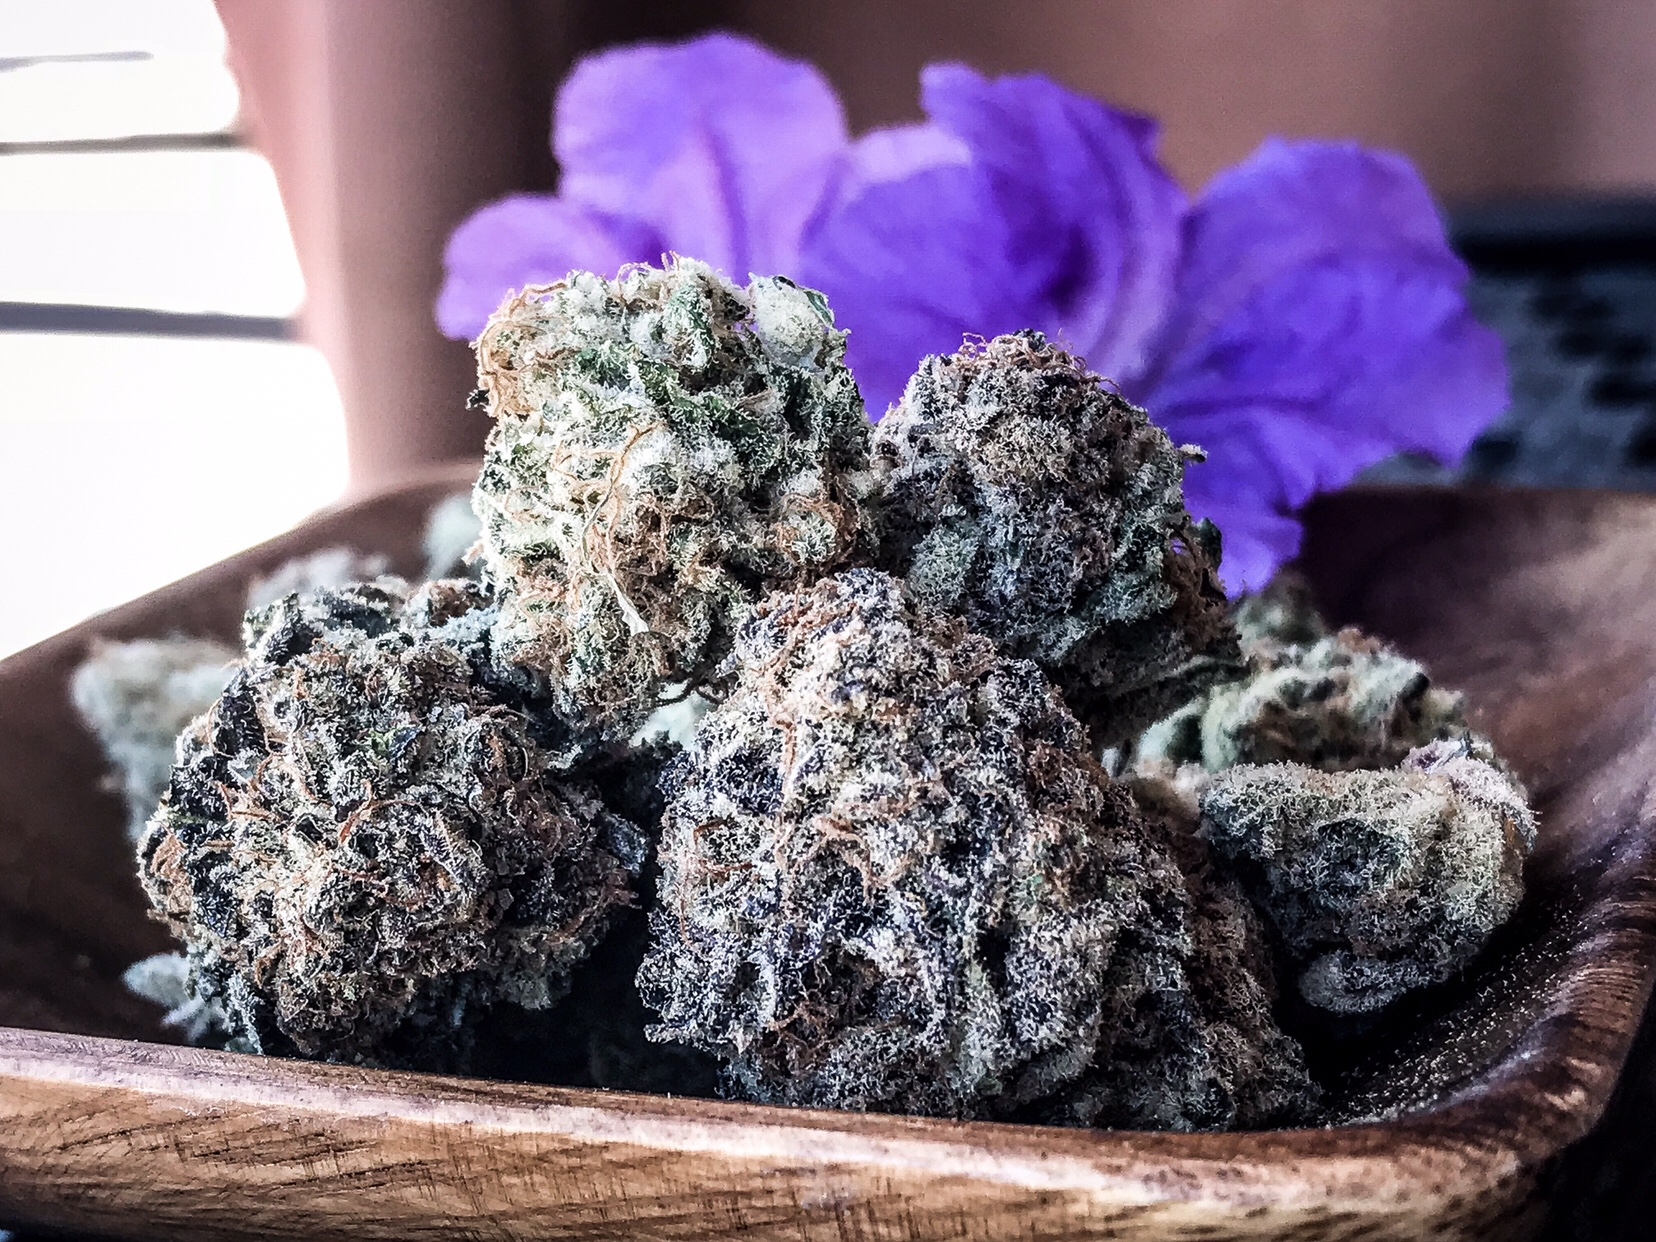 purple punch strain